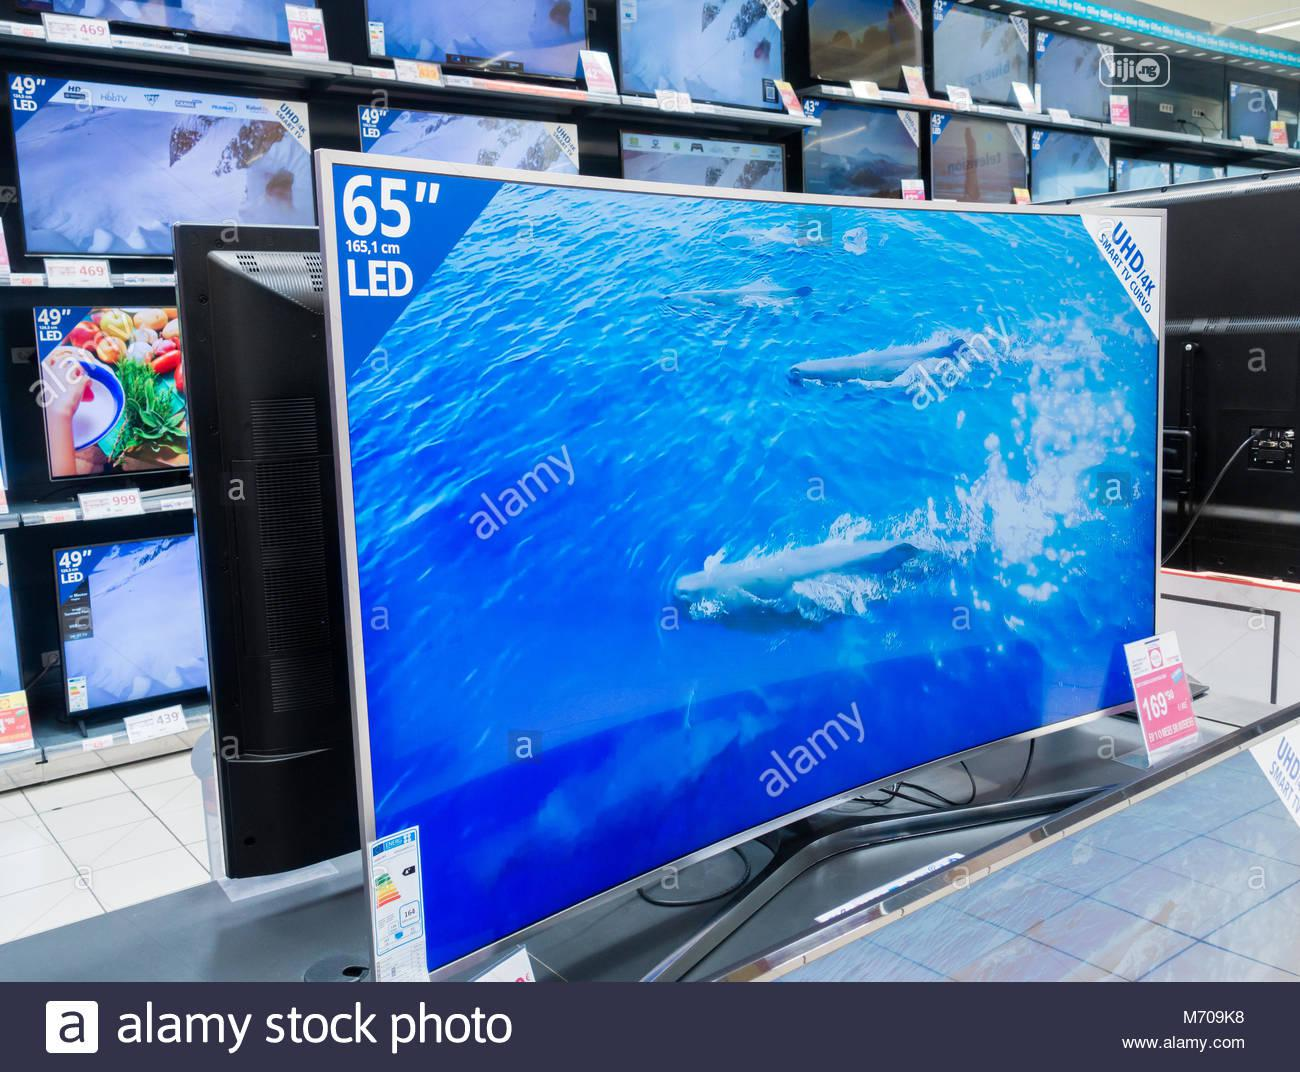 New Samsung Curved UHD Smart 4K Internet TV (RU7300) 2years